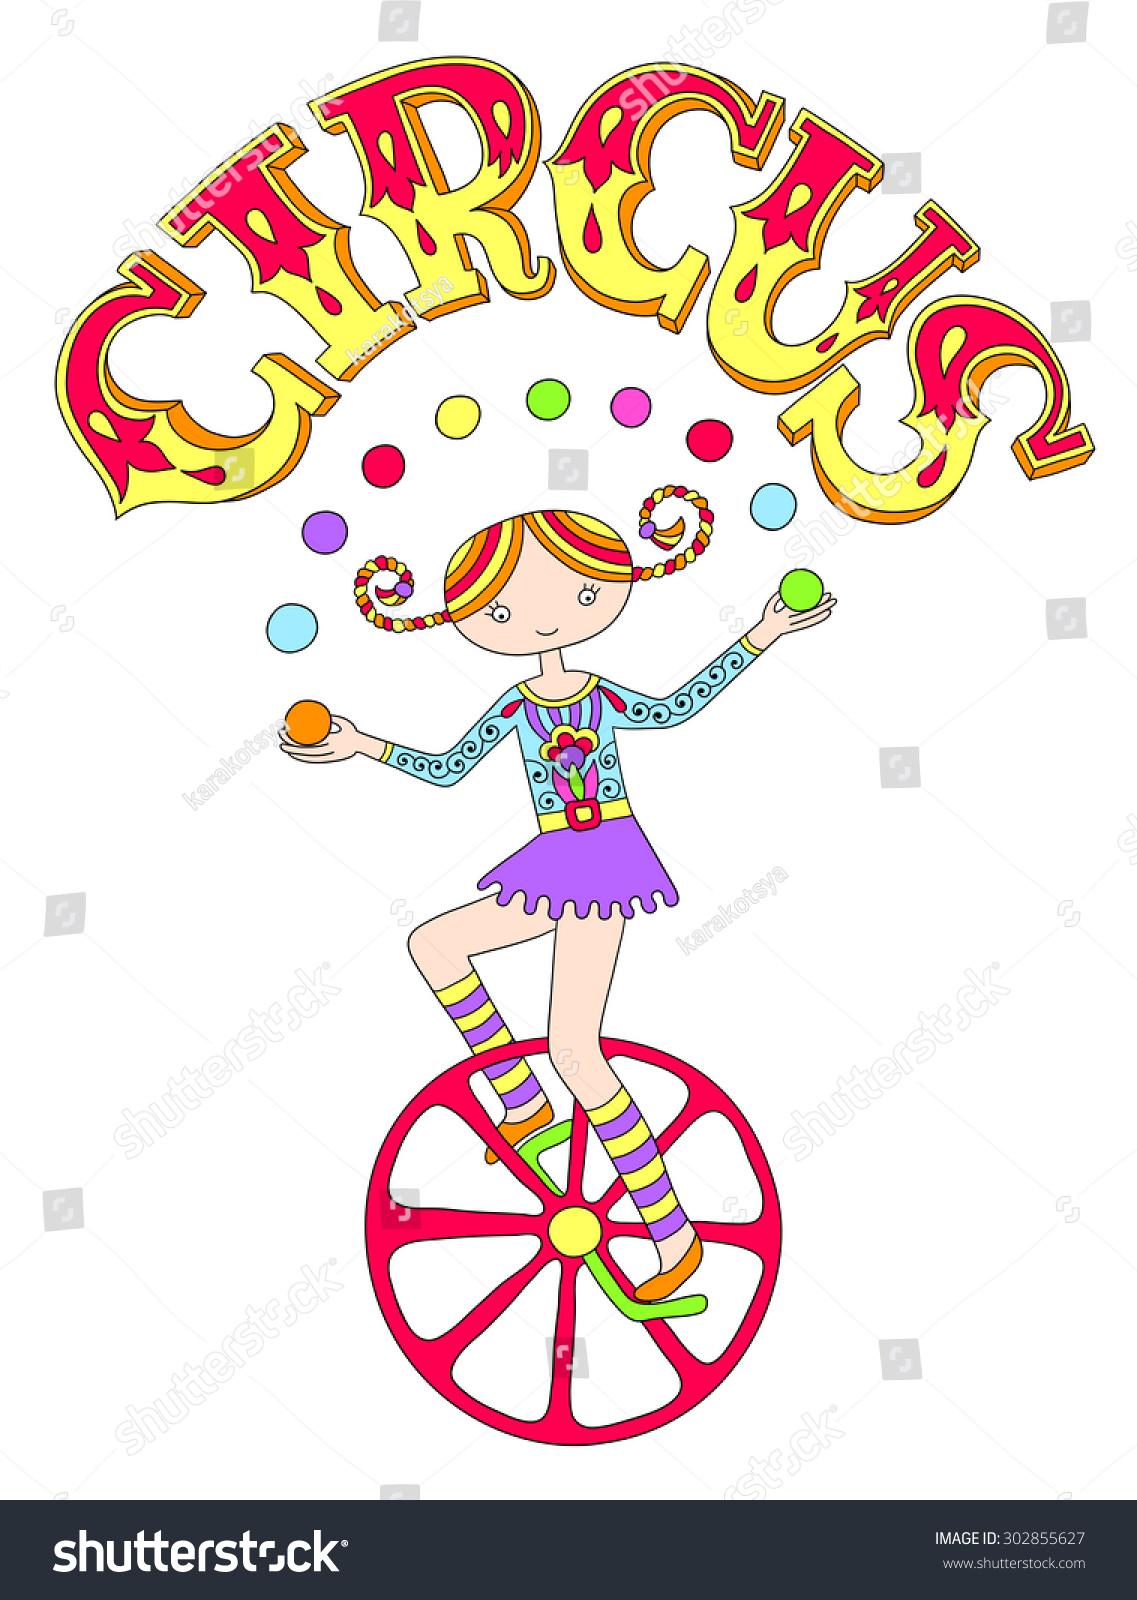 Line Art Unicycle : Line art drawing of circus theme teenage girl juggler on